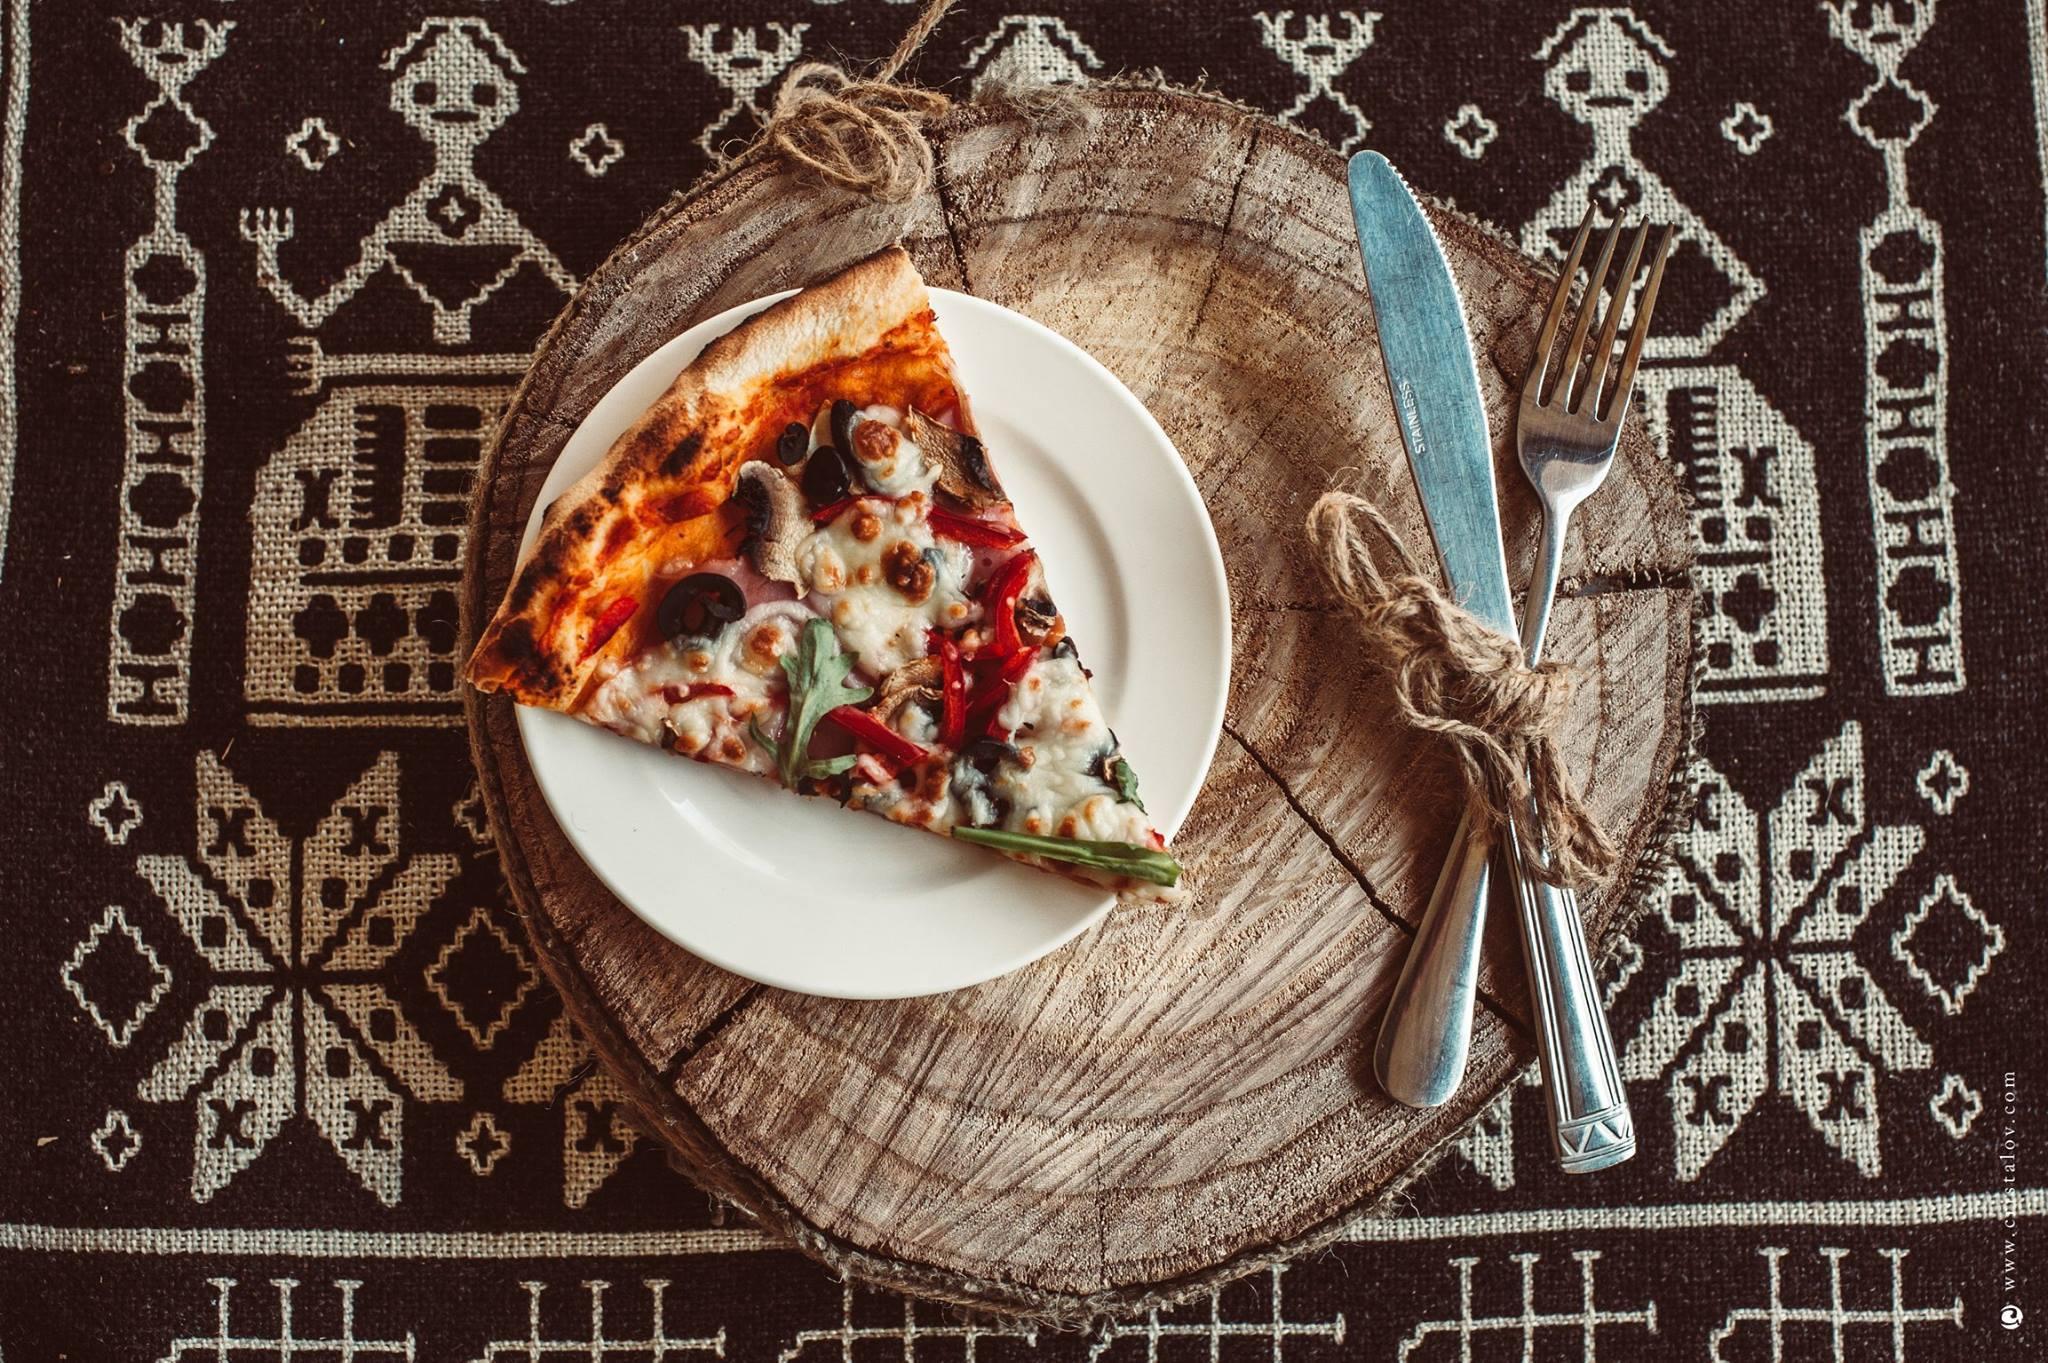 Cafeneaua La Cuptoraș - Luni - Vineri de la 12:00 la 18:00